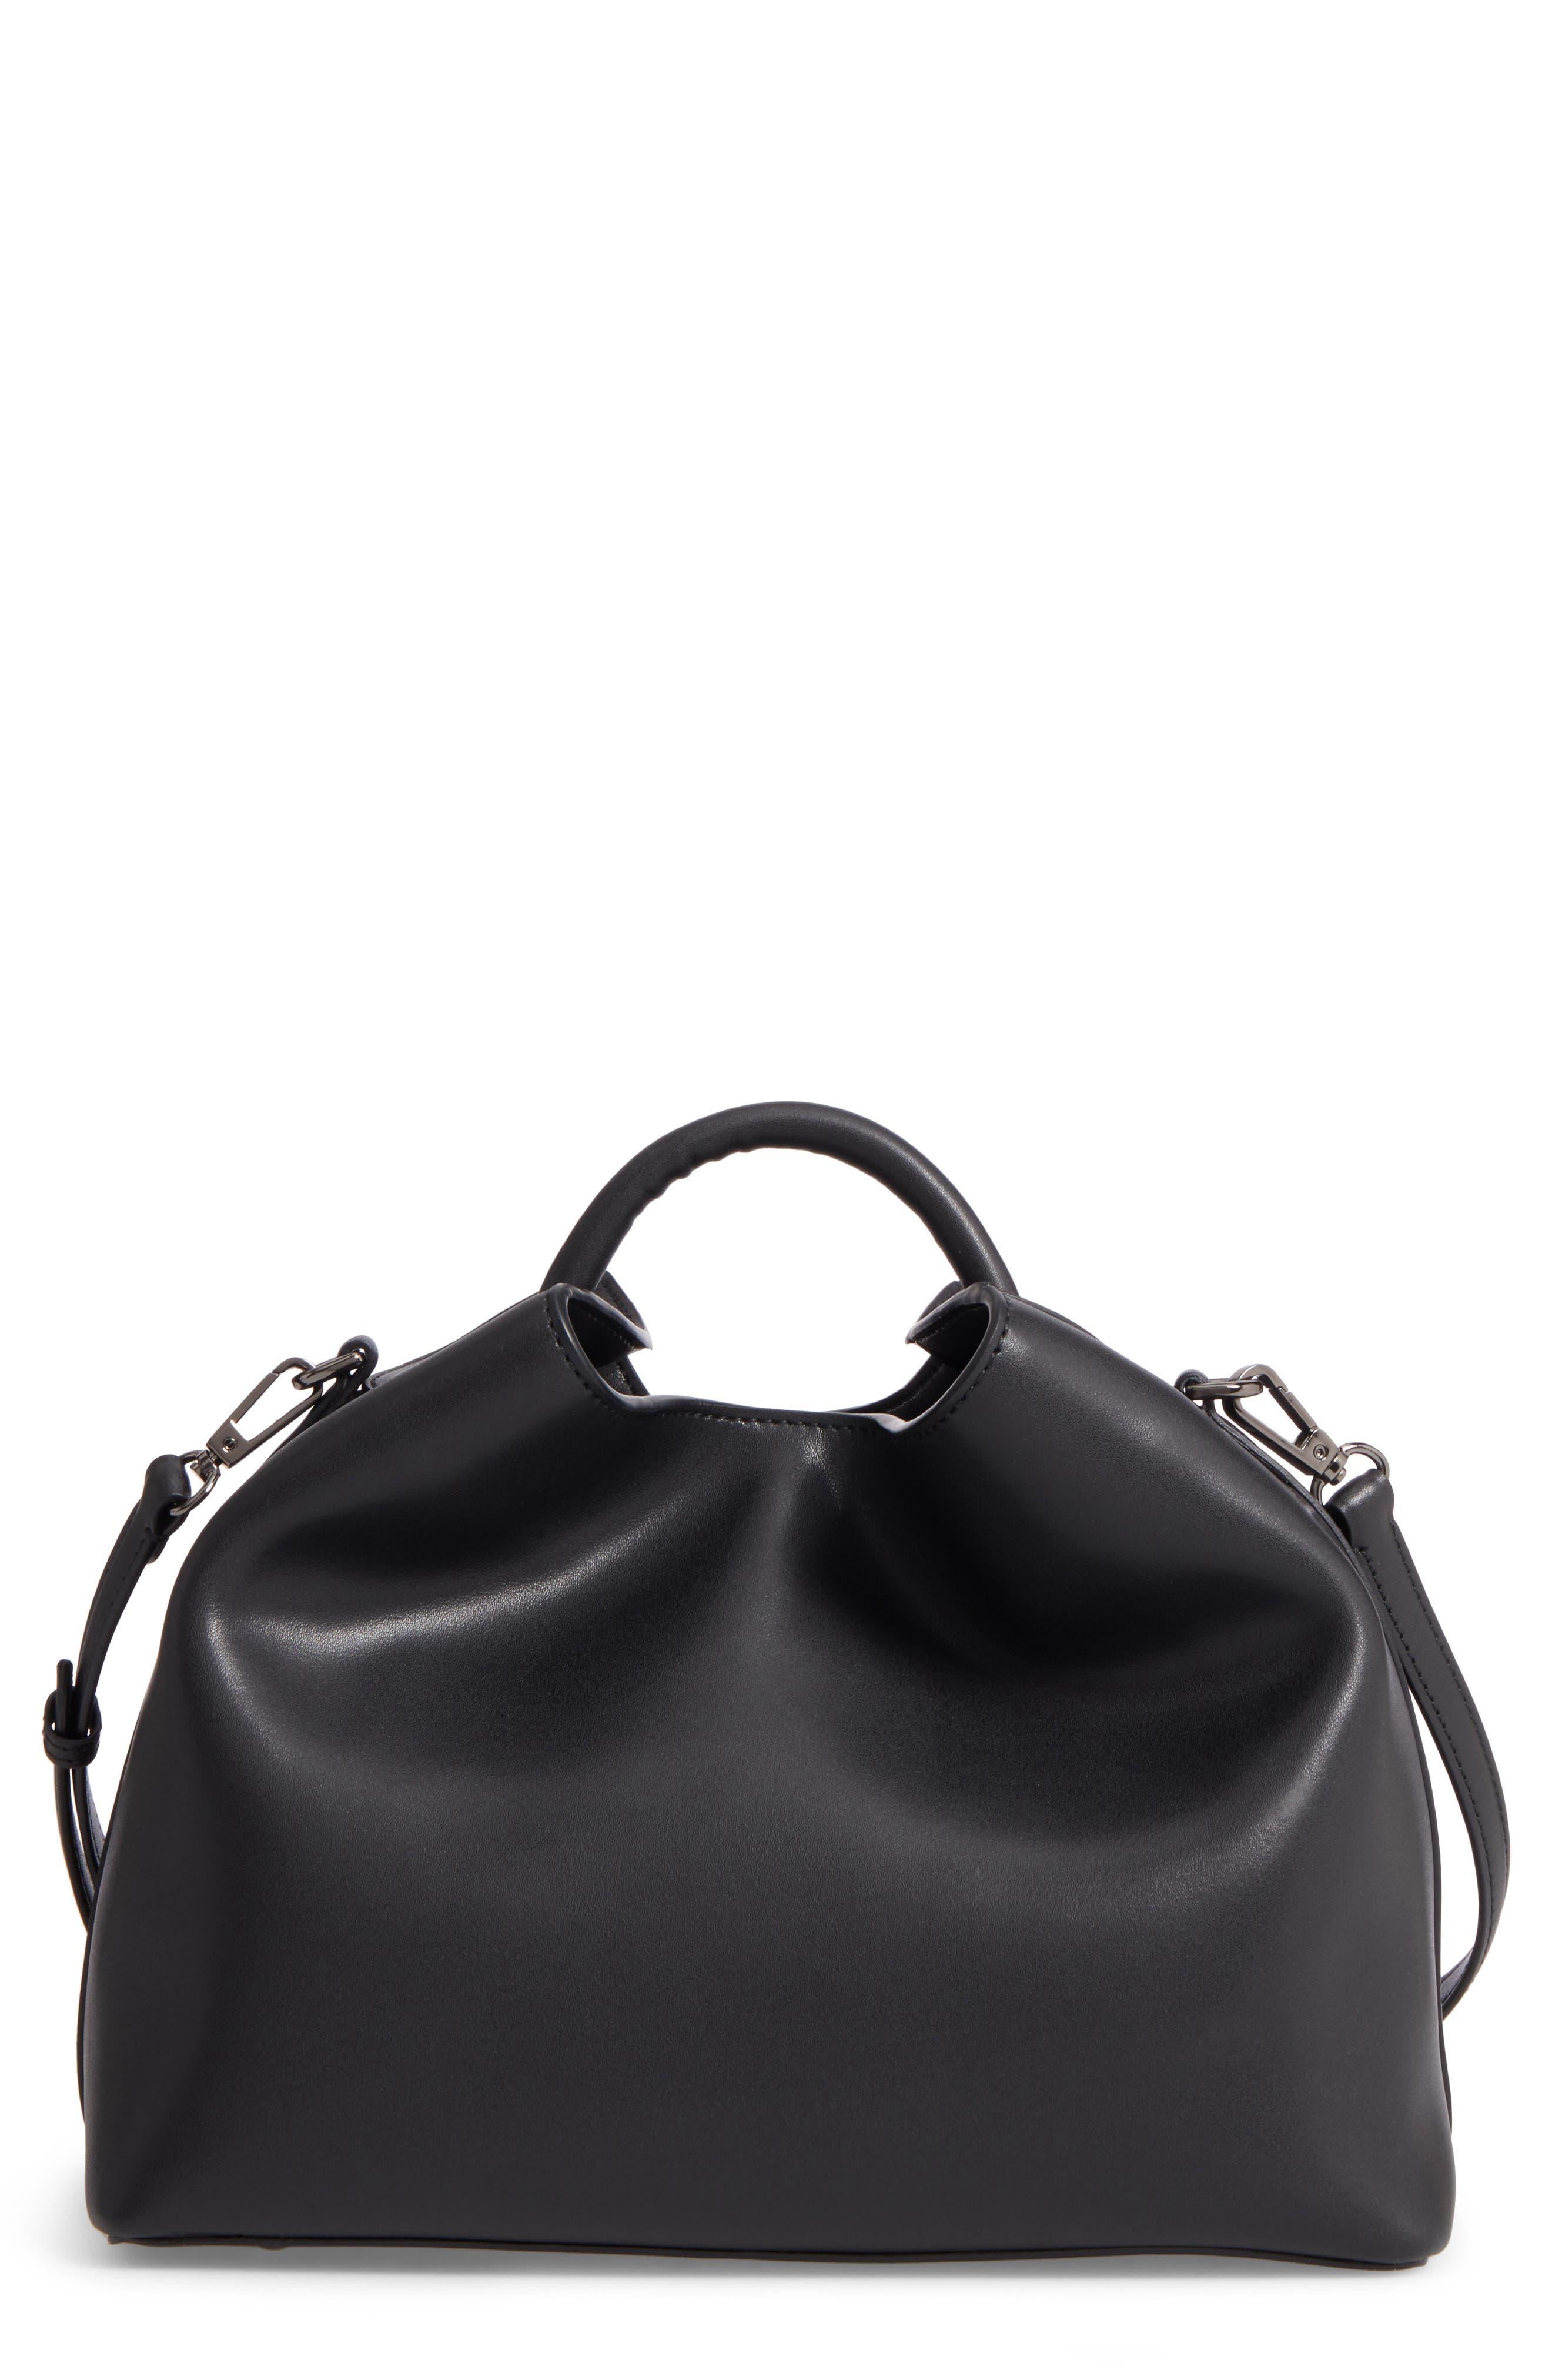 Raisin Leather Handbag,                         Main,                         color,